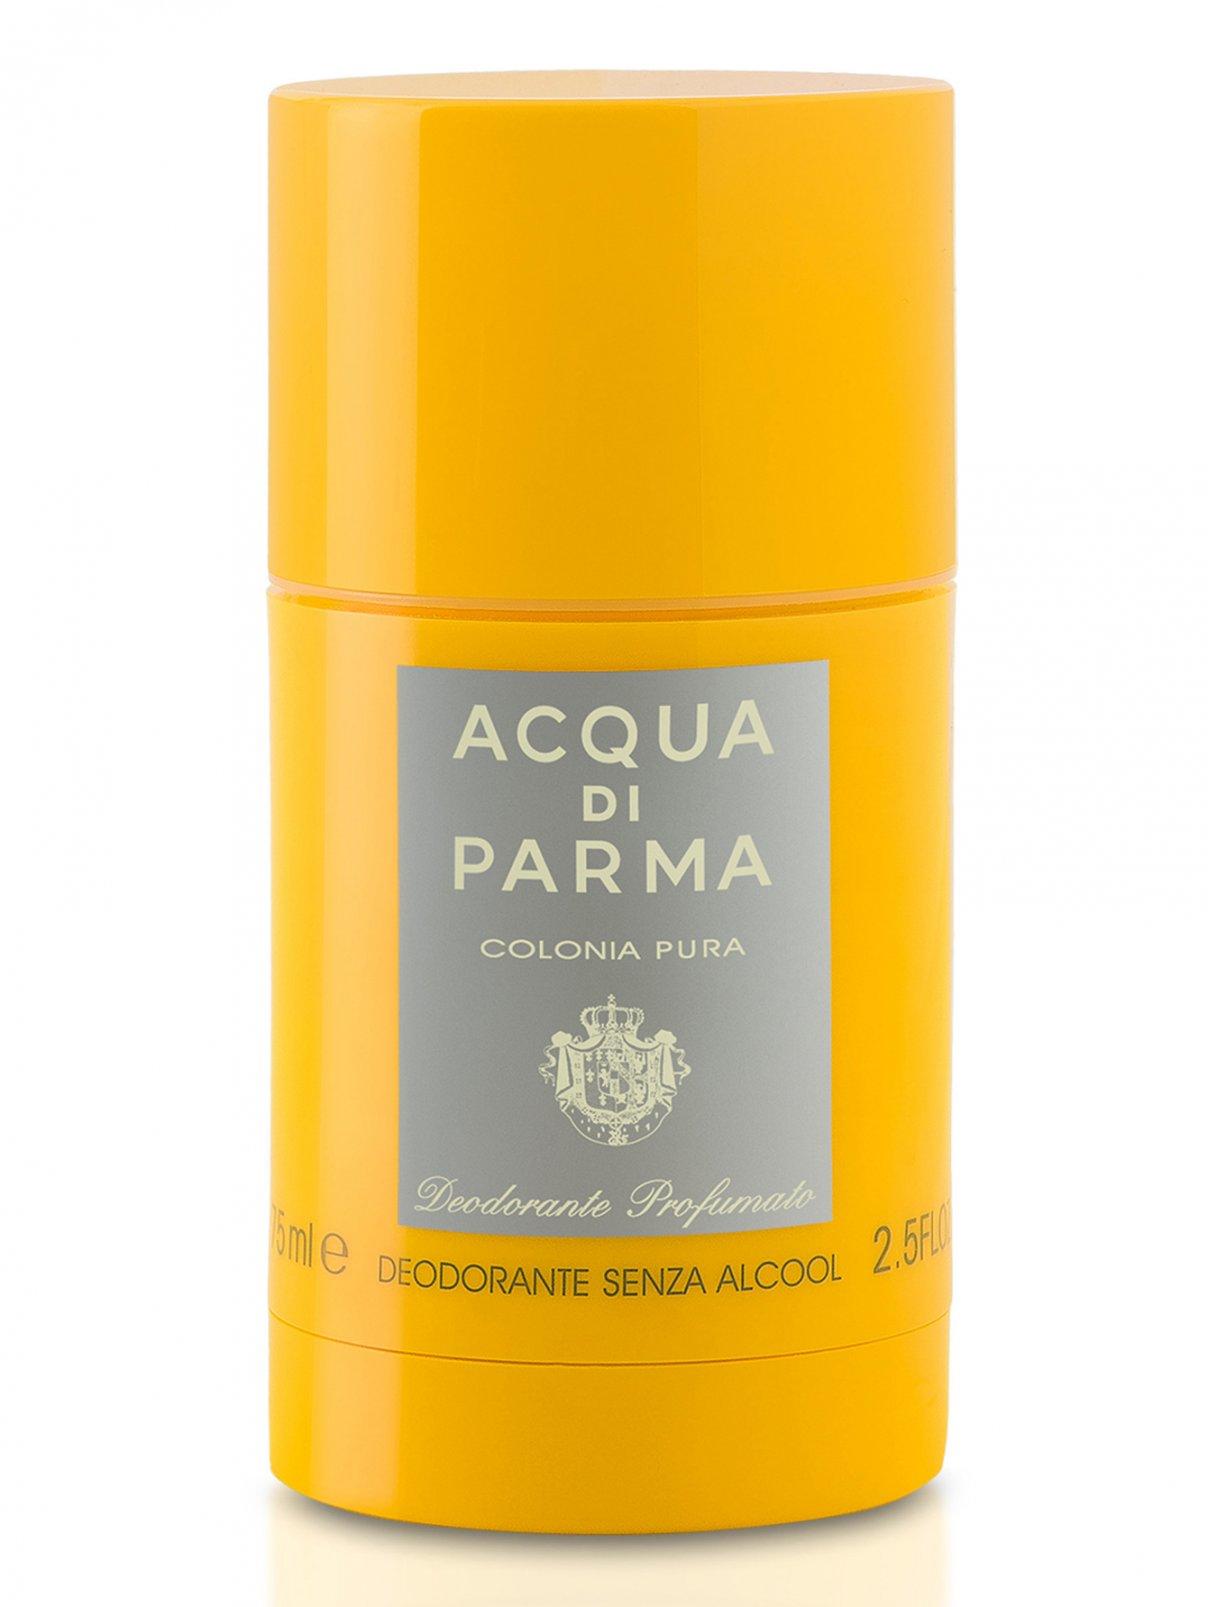 Дезодорант стик Colonia Pura Acqua di Parma  –  Общий вид